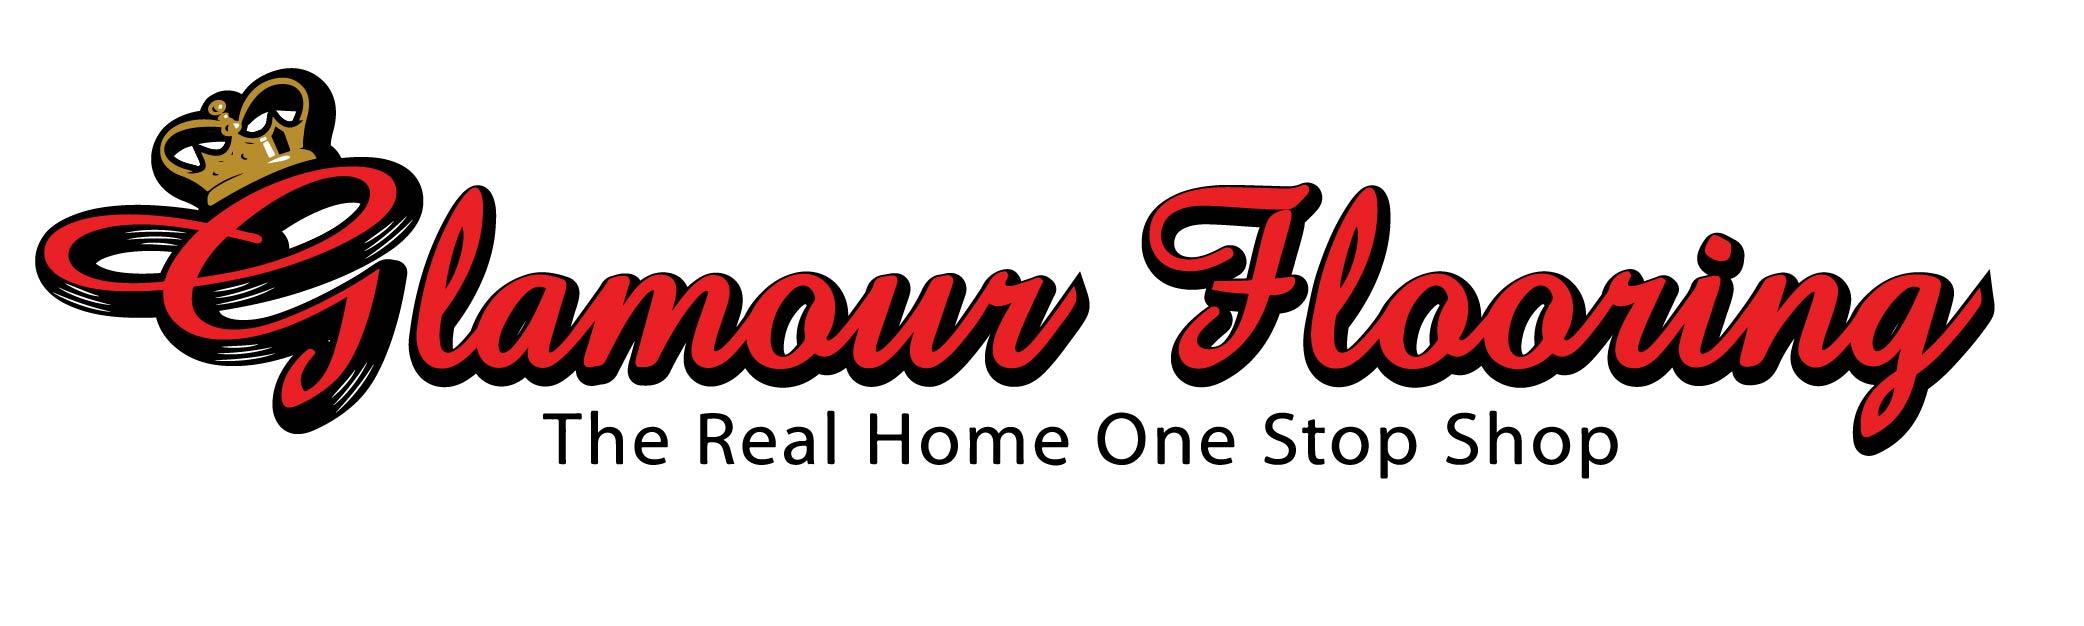 Glamour Flooring - 920 Mason Rd #C, Katy, TX 77450